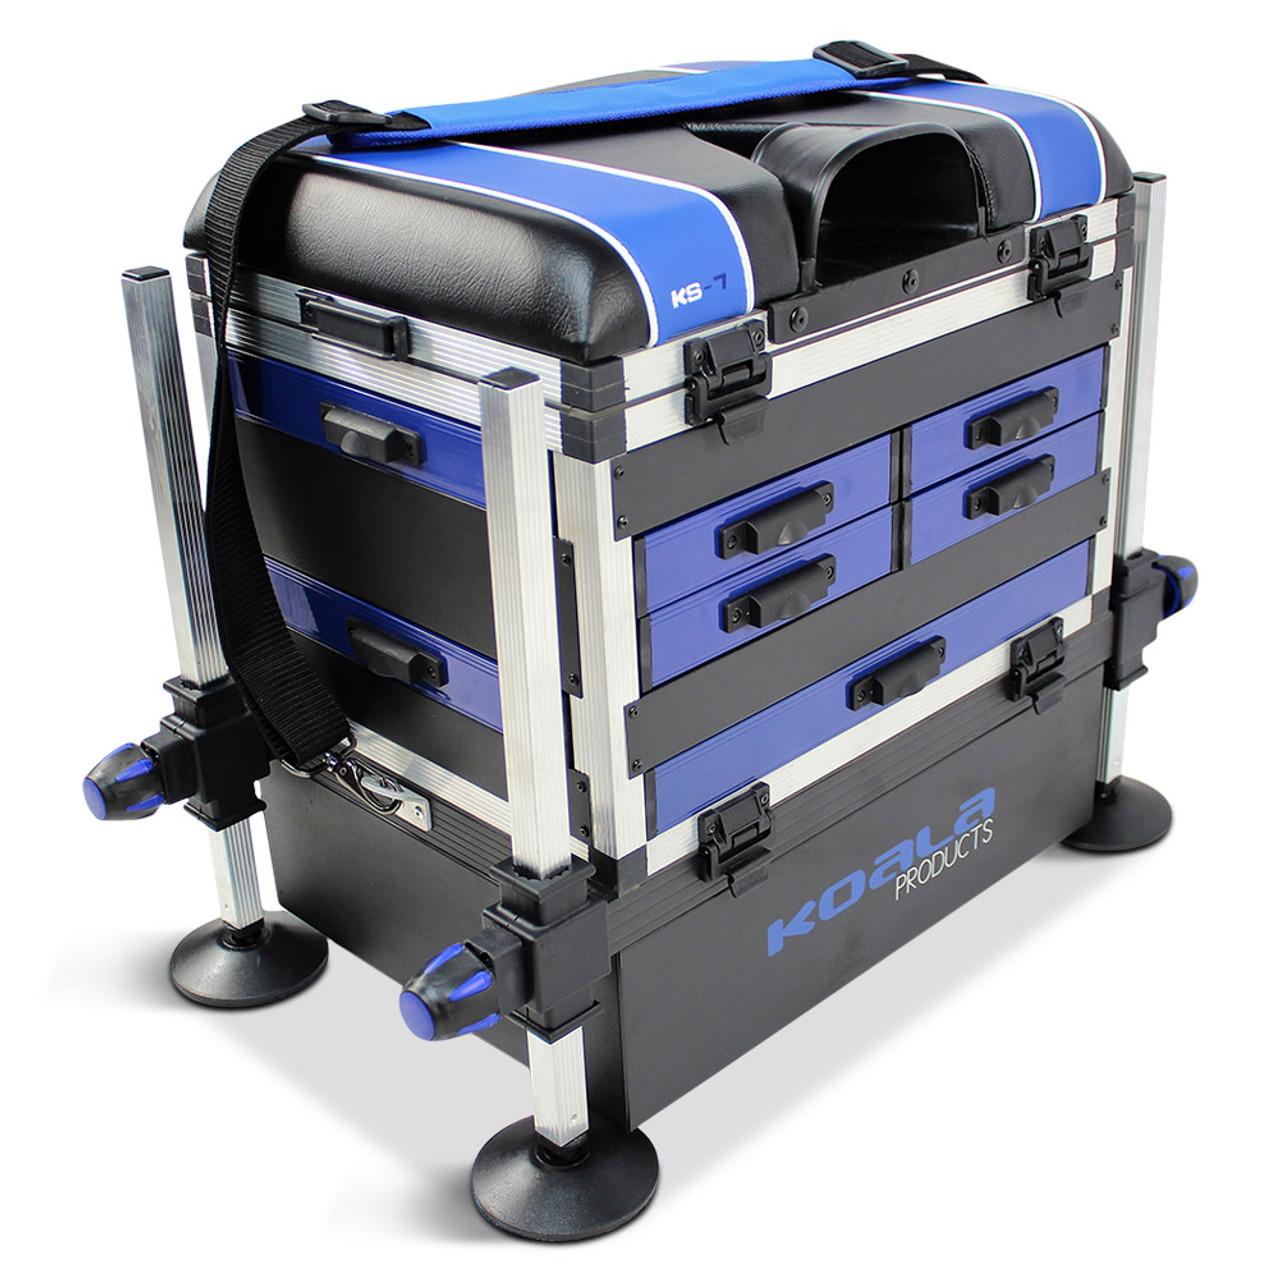 WORLD CLASS SEAT TACKLE SYSTEM CARP POLE FISHING SEAT BOX CHAIR STATION